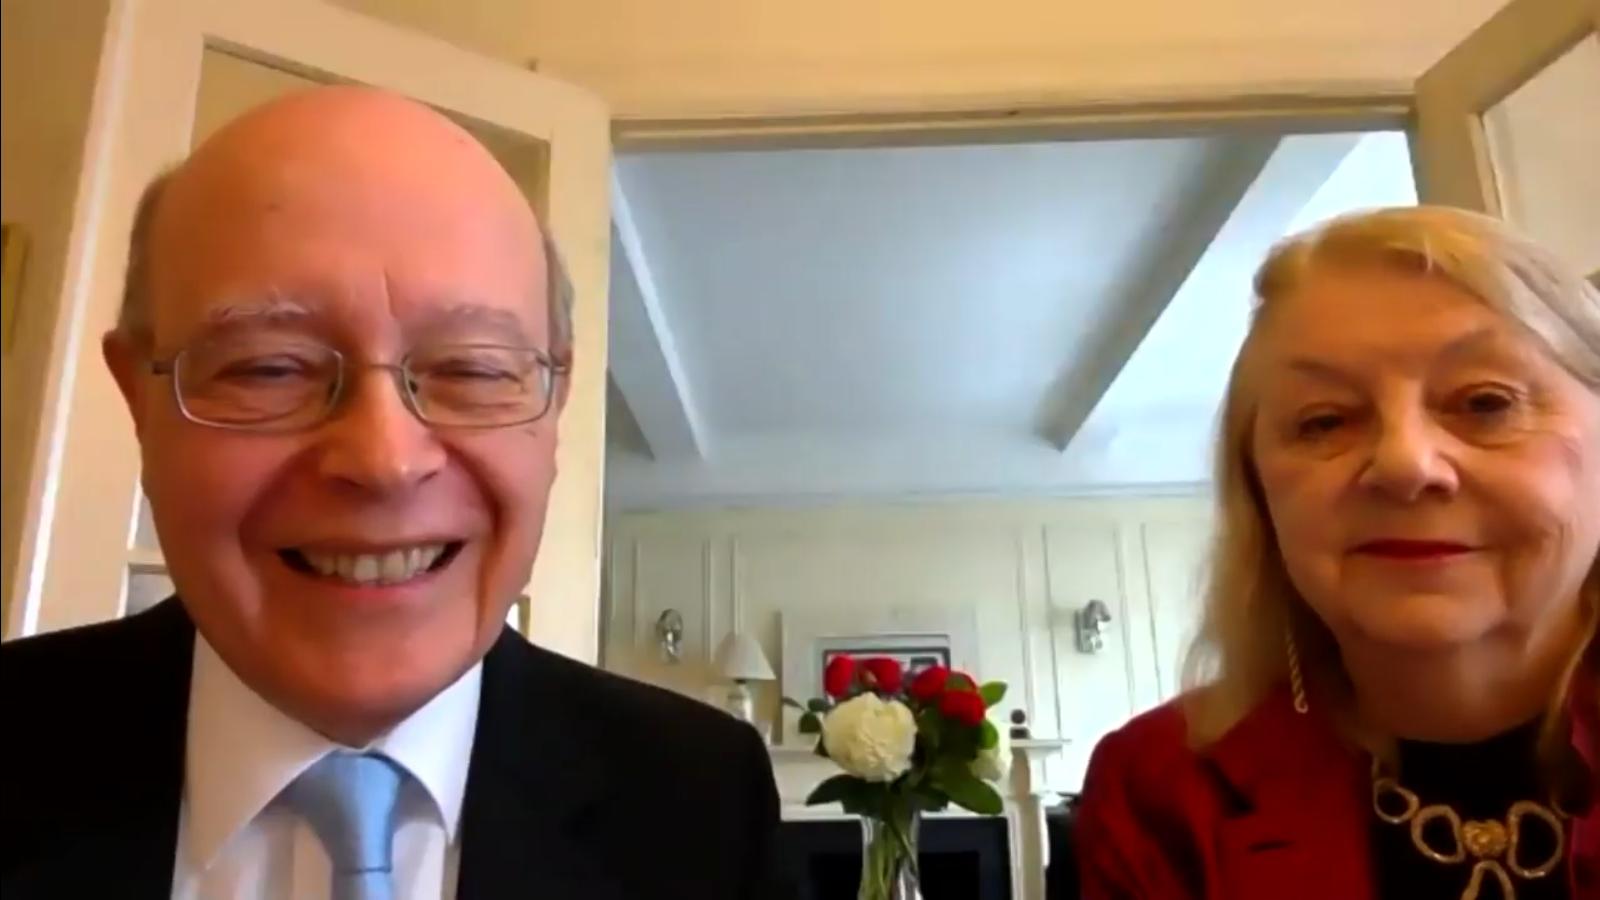 Marjan Kiepura and his wife Jane Knox-Kiepura were part of the online ceremony and discussion. (Photo: Screenshot)